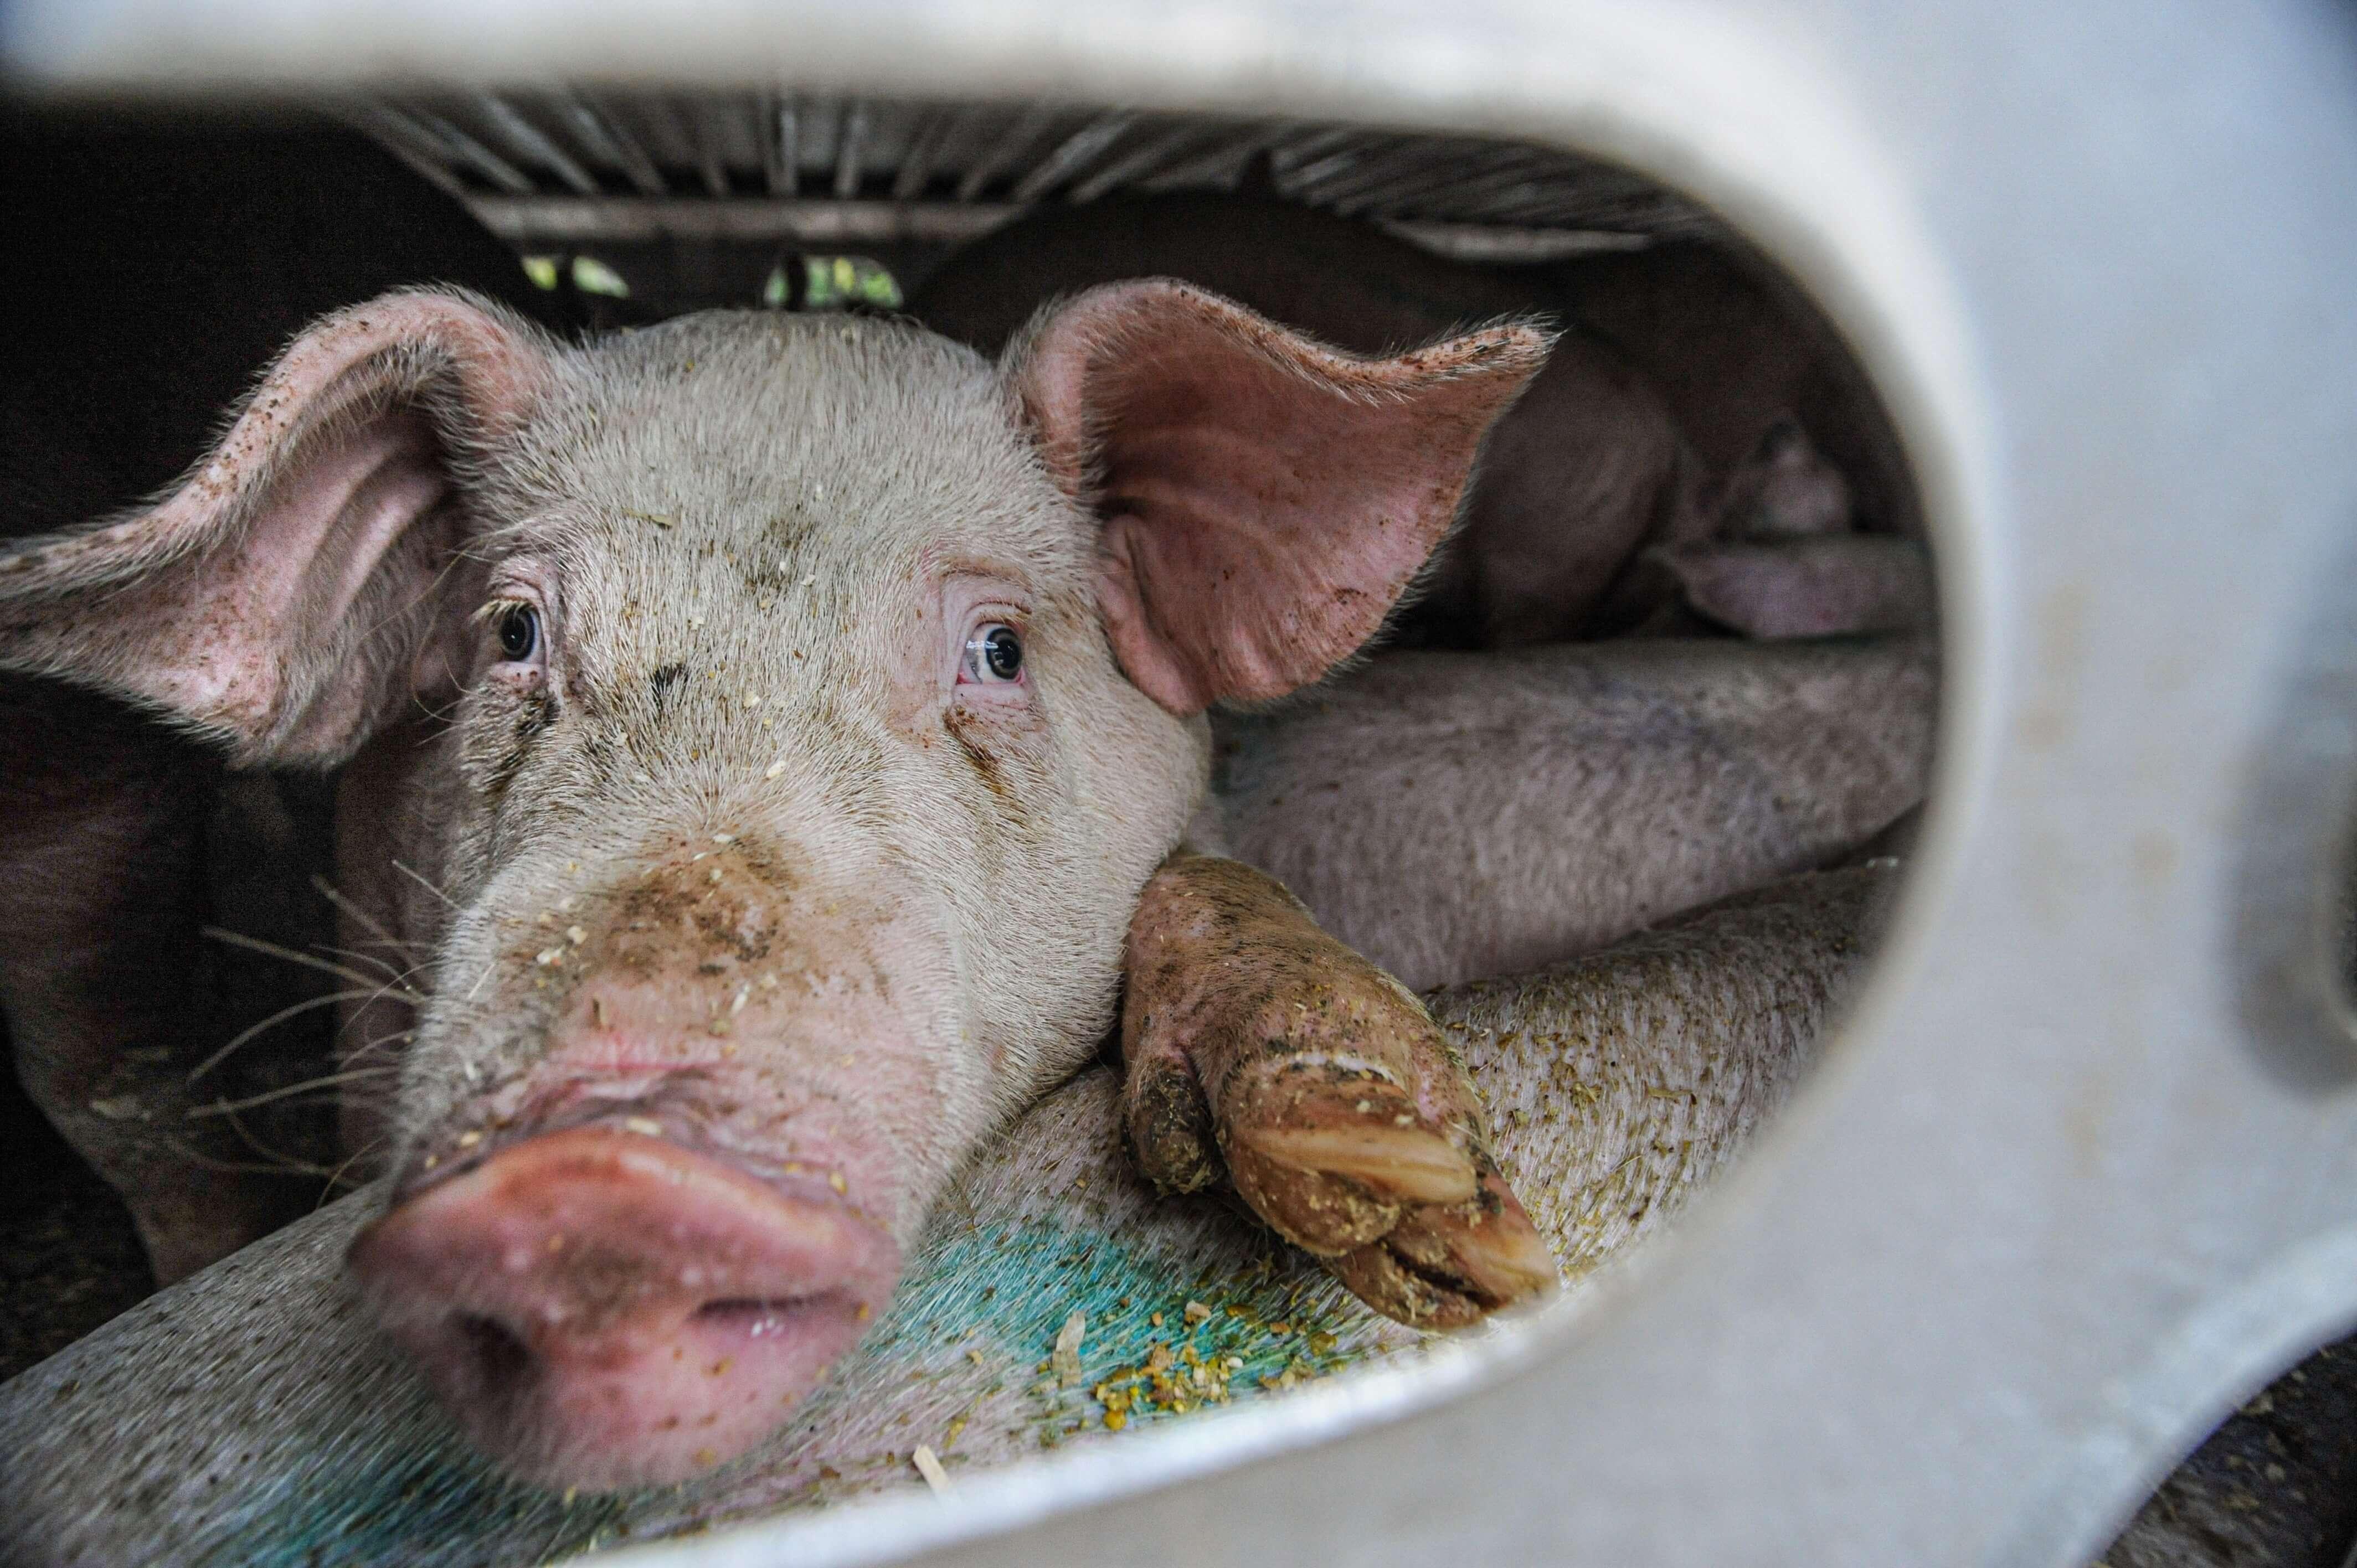 Transporting pigs